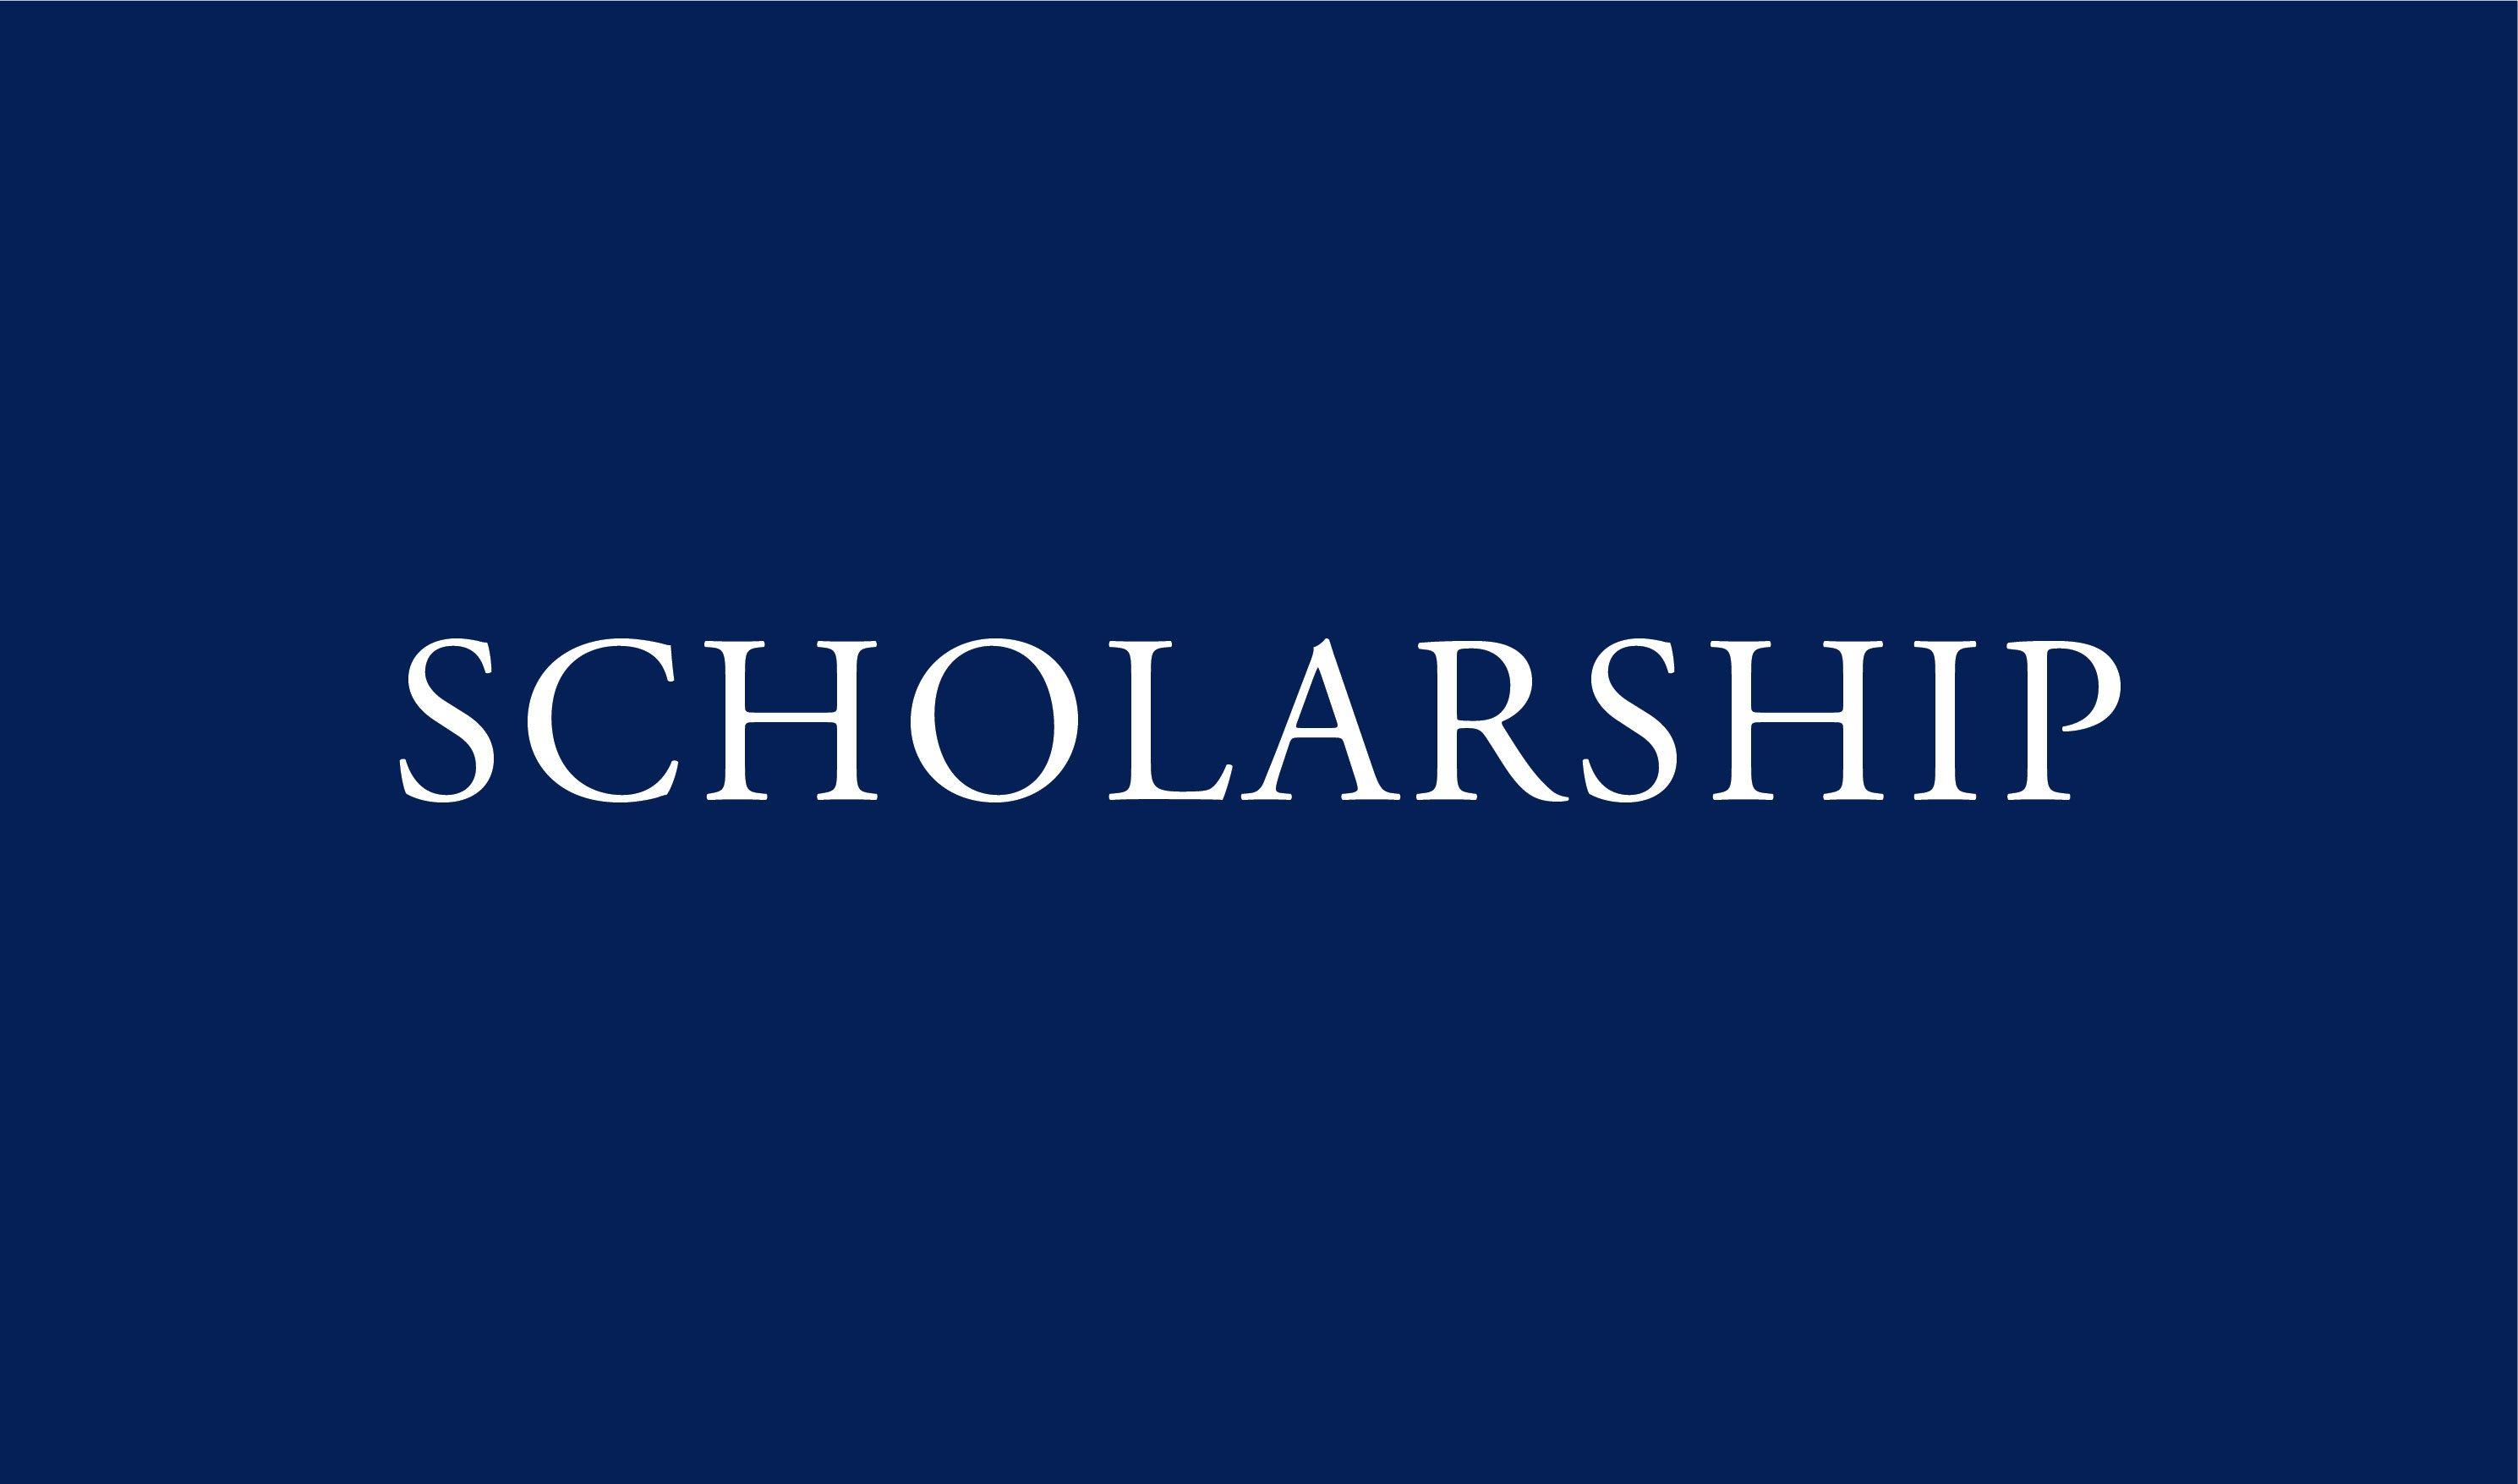 scholarship 2020 october